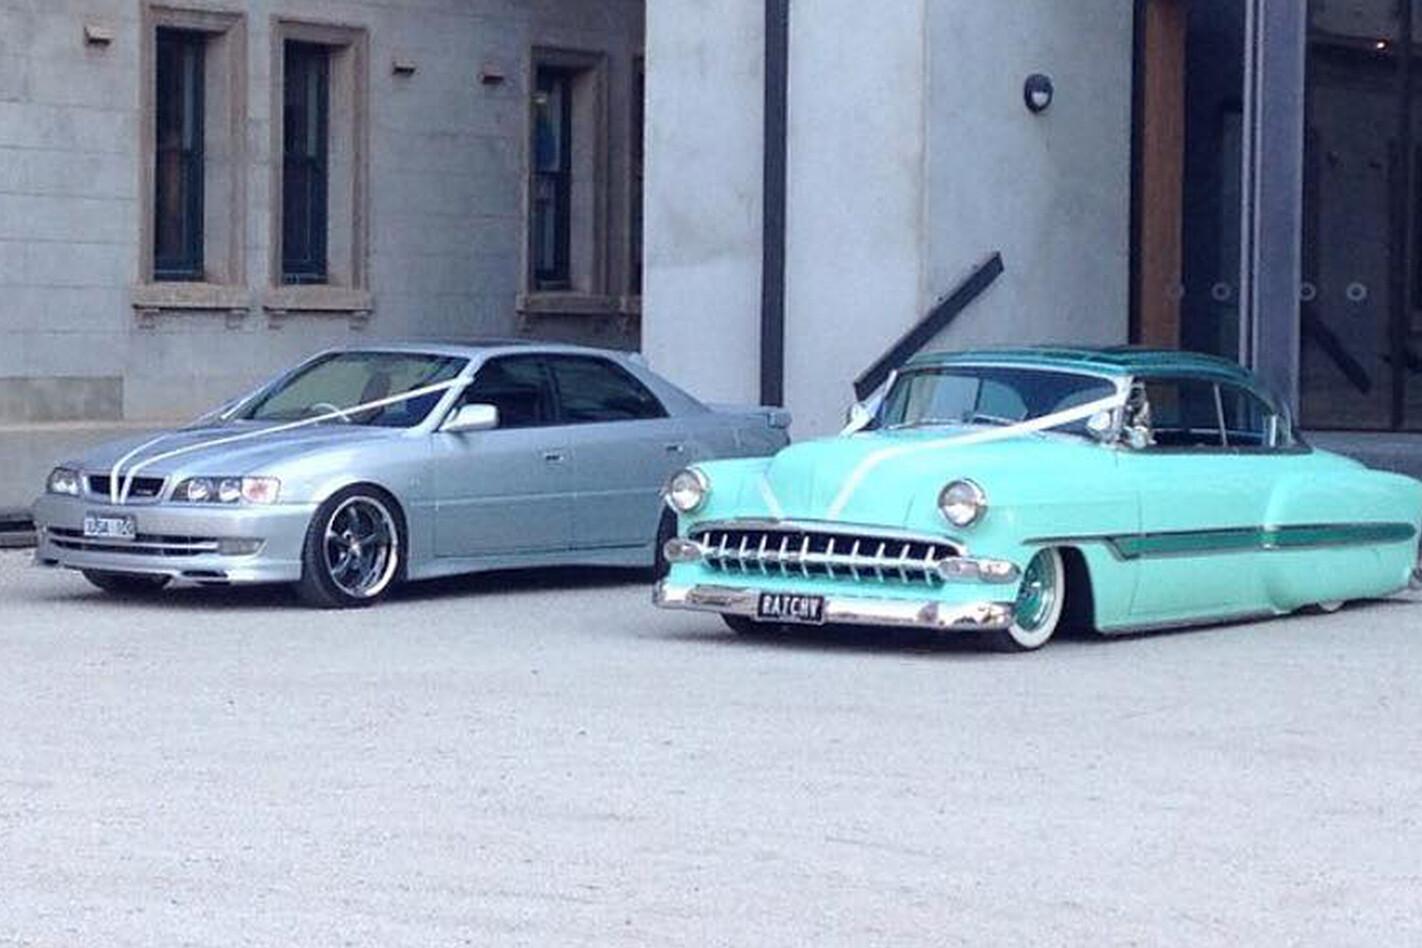 Holly Nelson's wedding cars